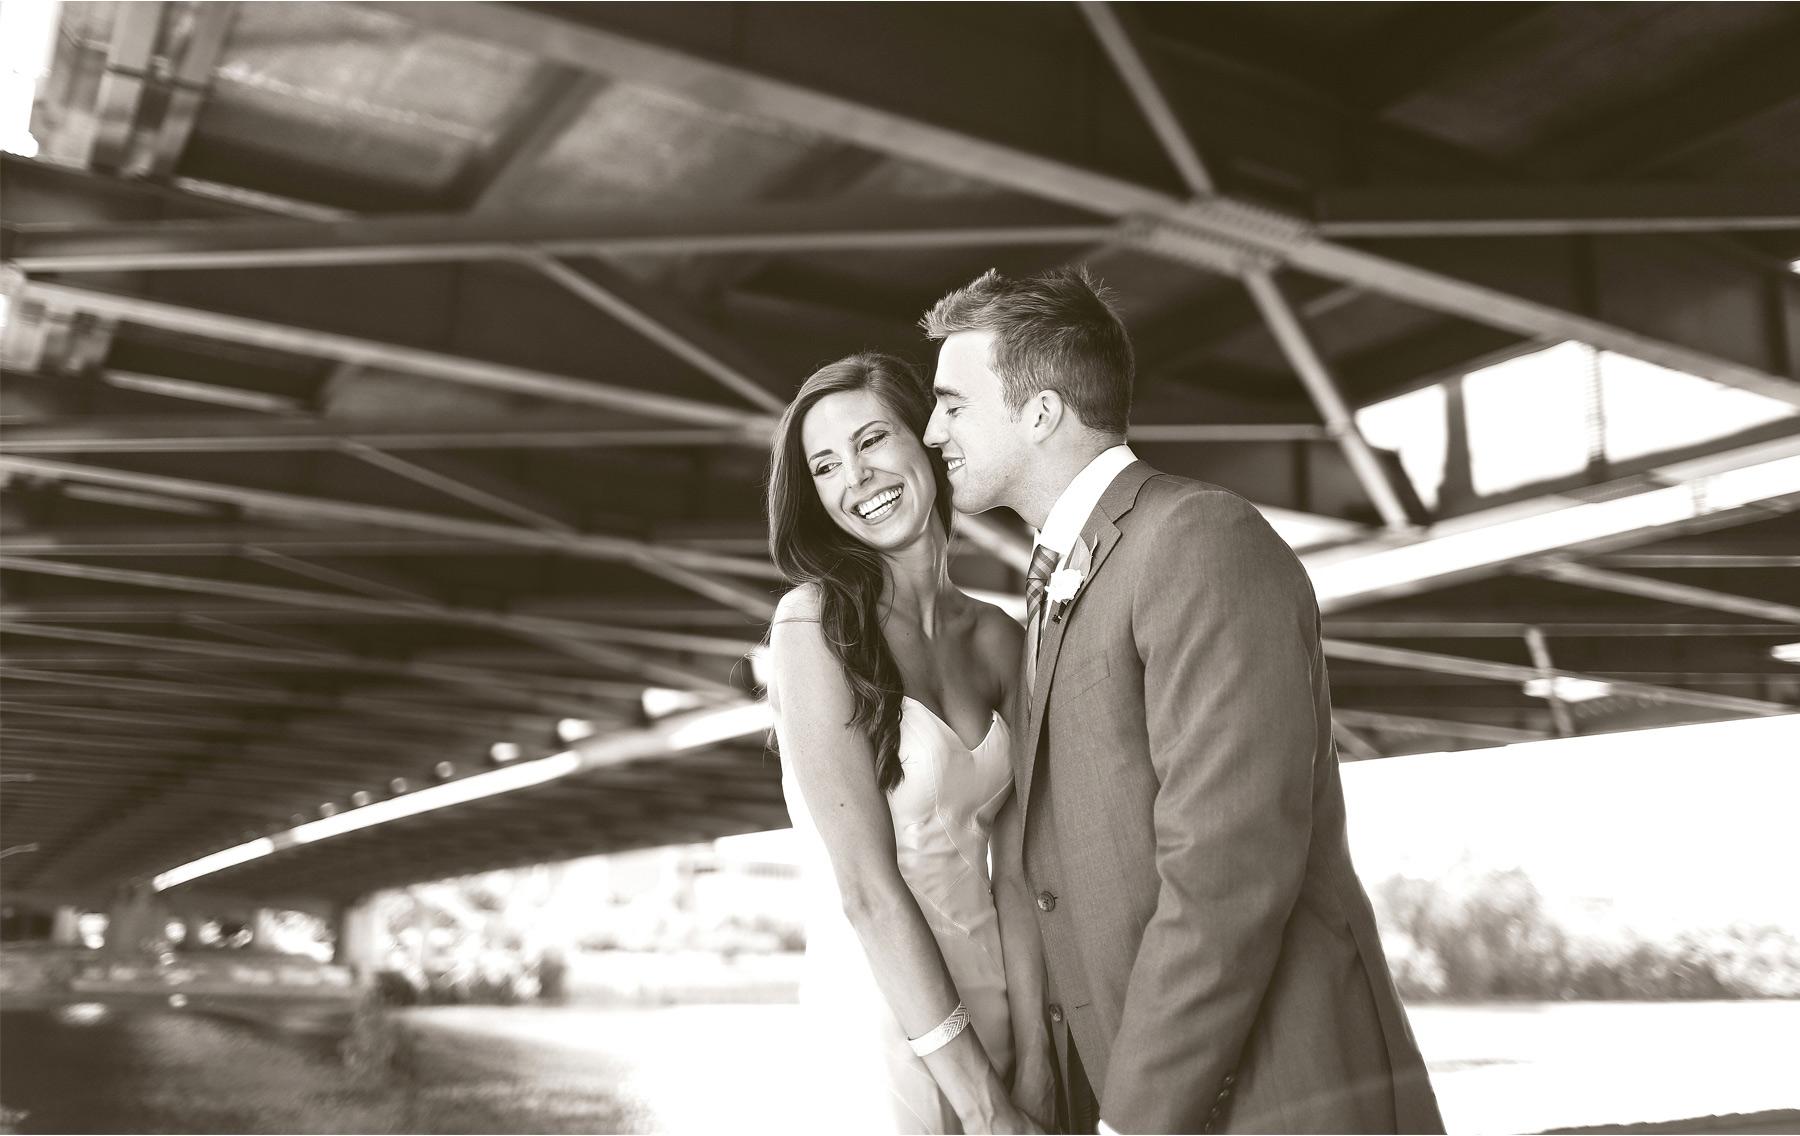 07-Minneapolis-Minnesota-Wedding-Photography-by-Vick-Photography-Katie-&-Joe.jpg